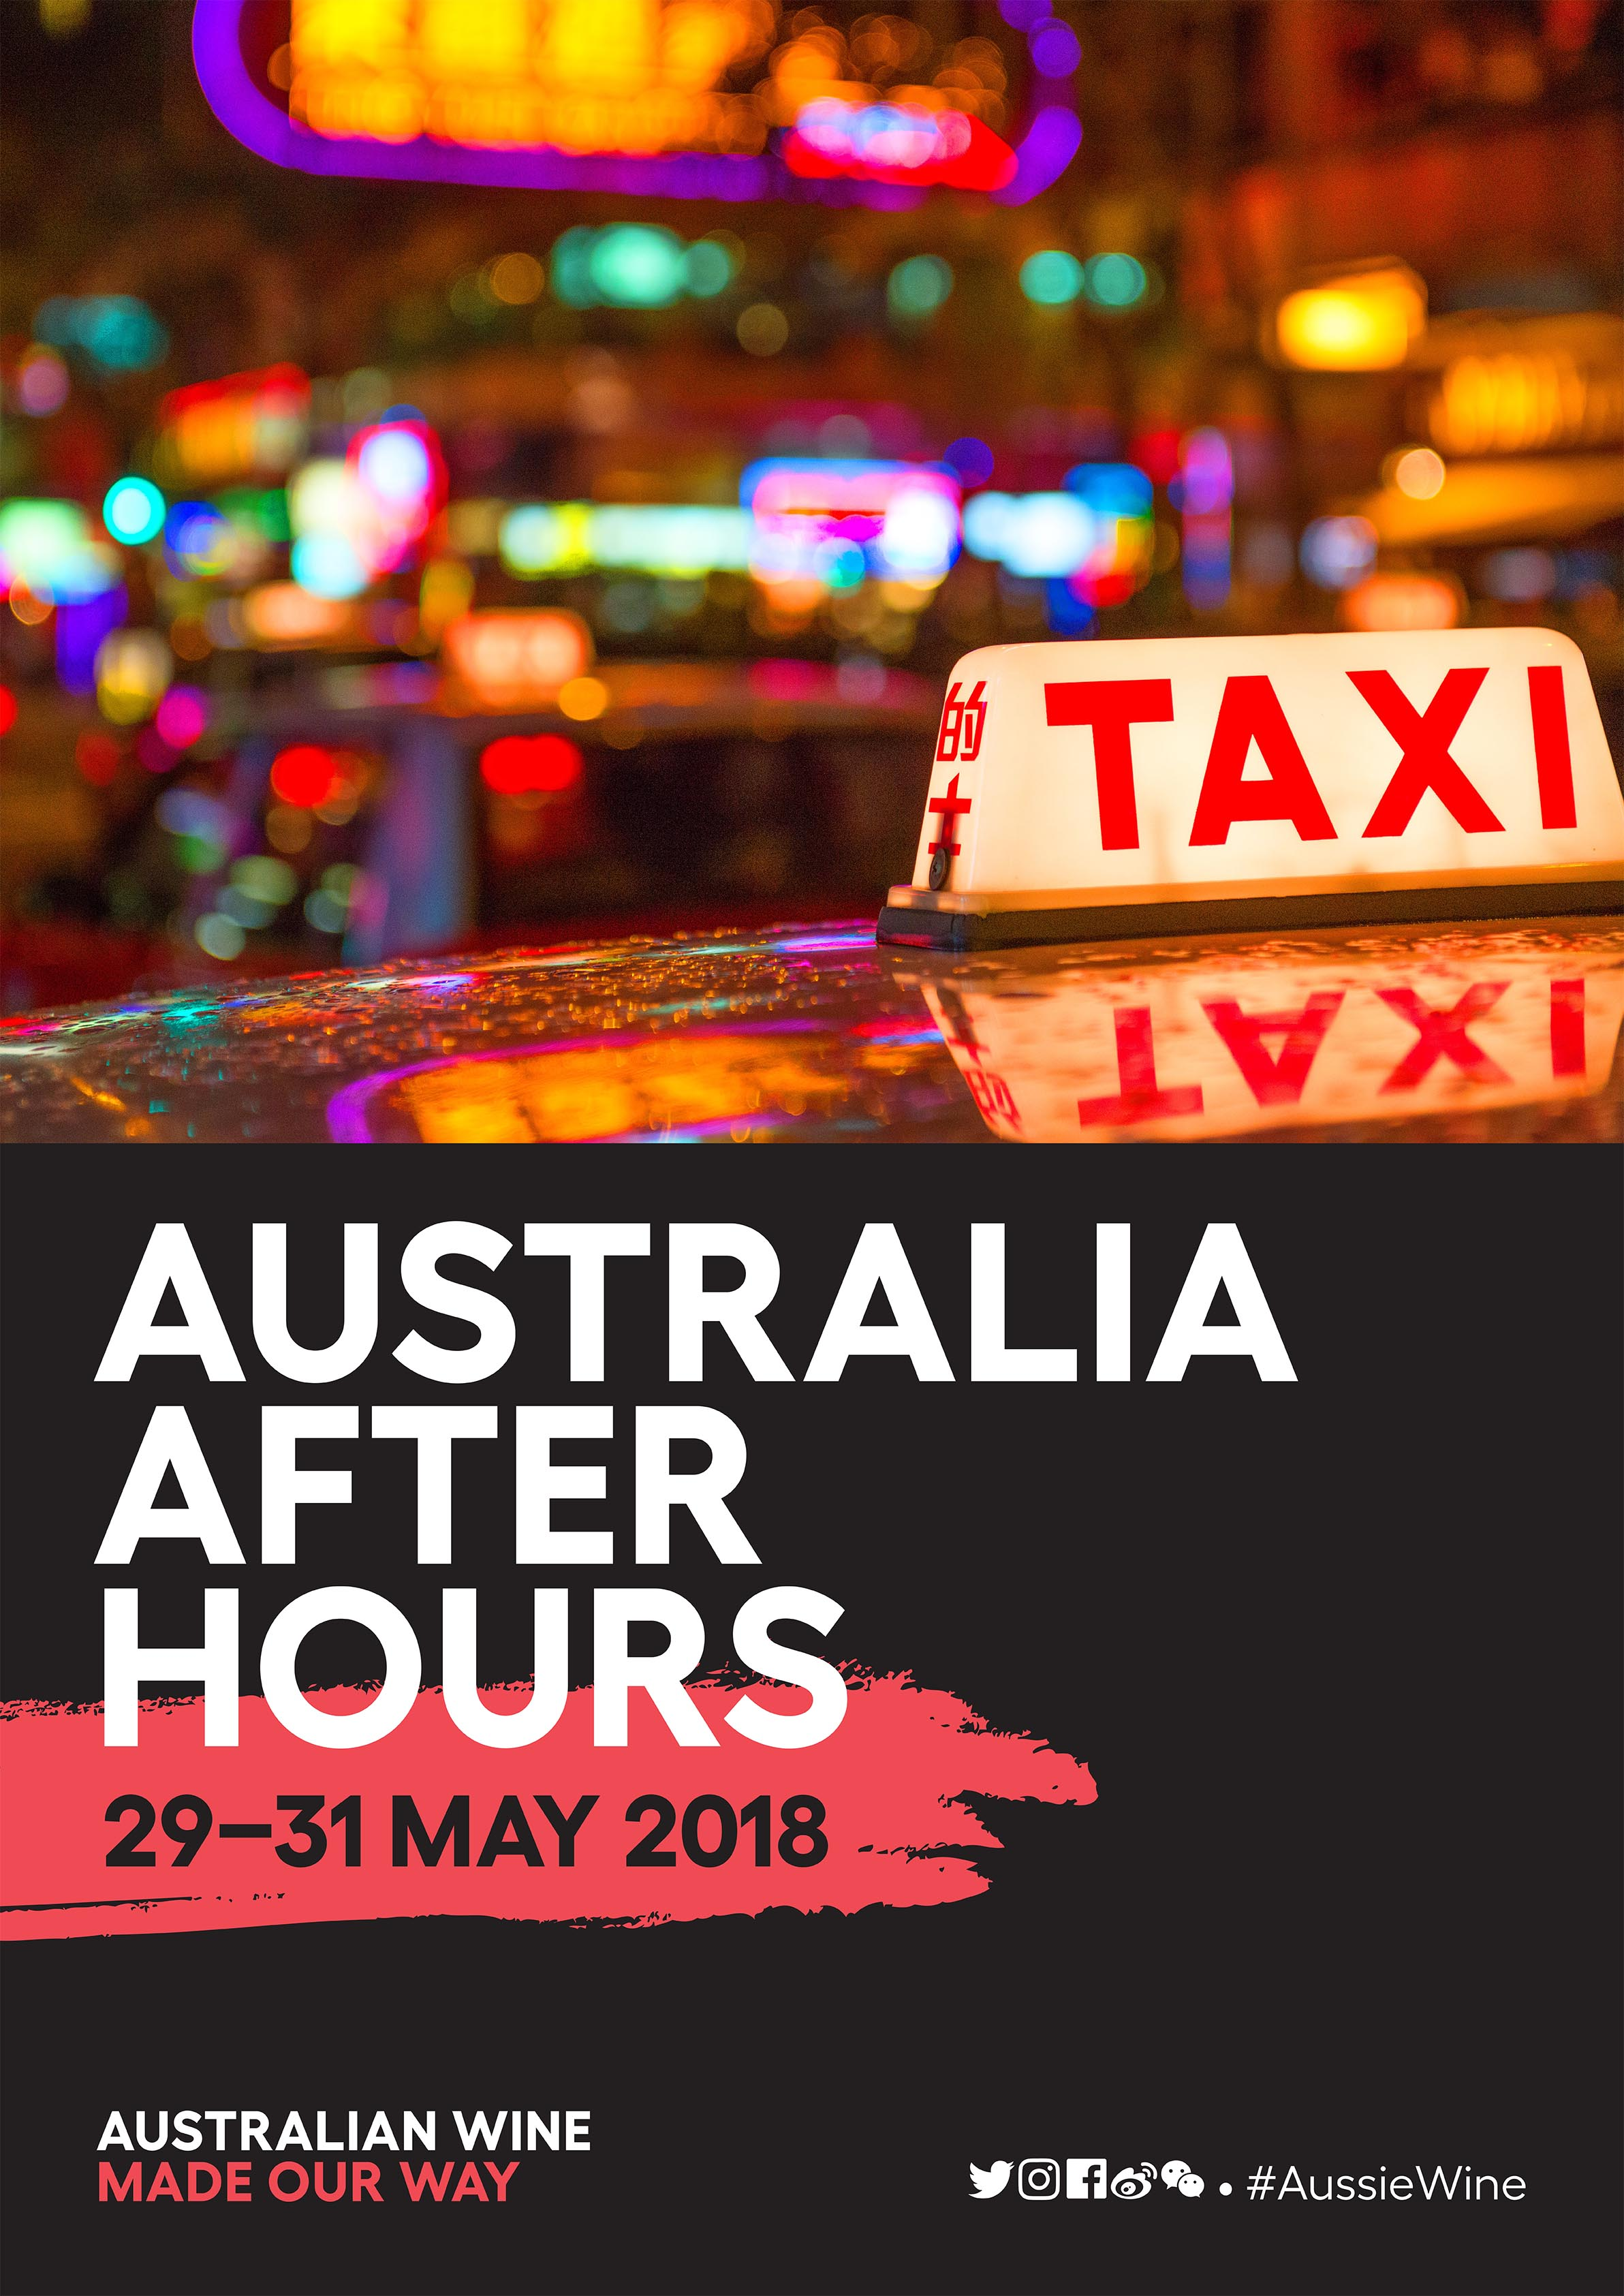 AP_VEHK2018_AusAfterHours_DJSign.jpg